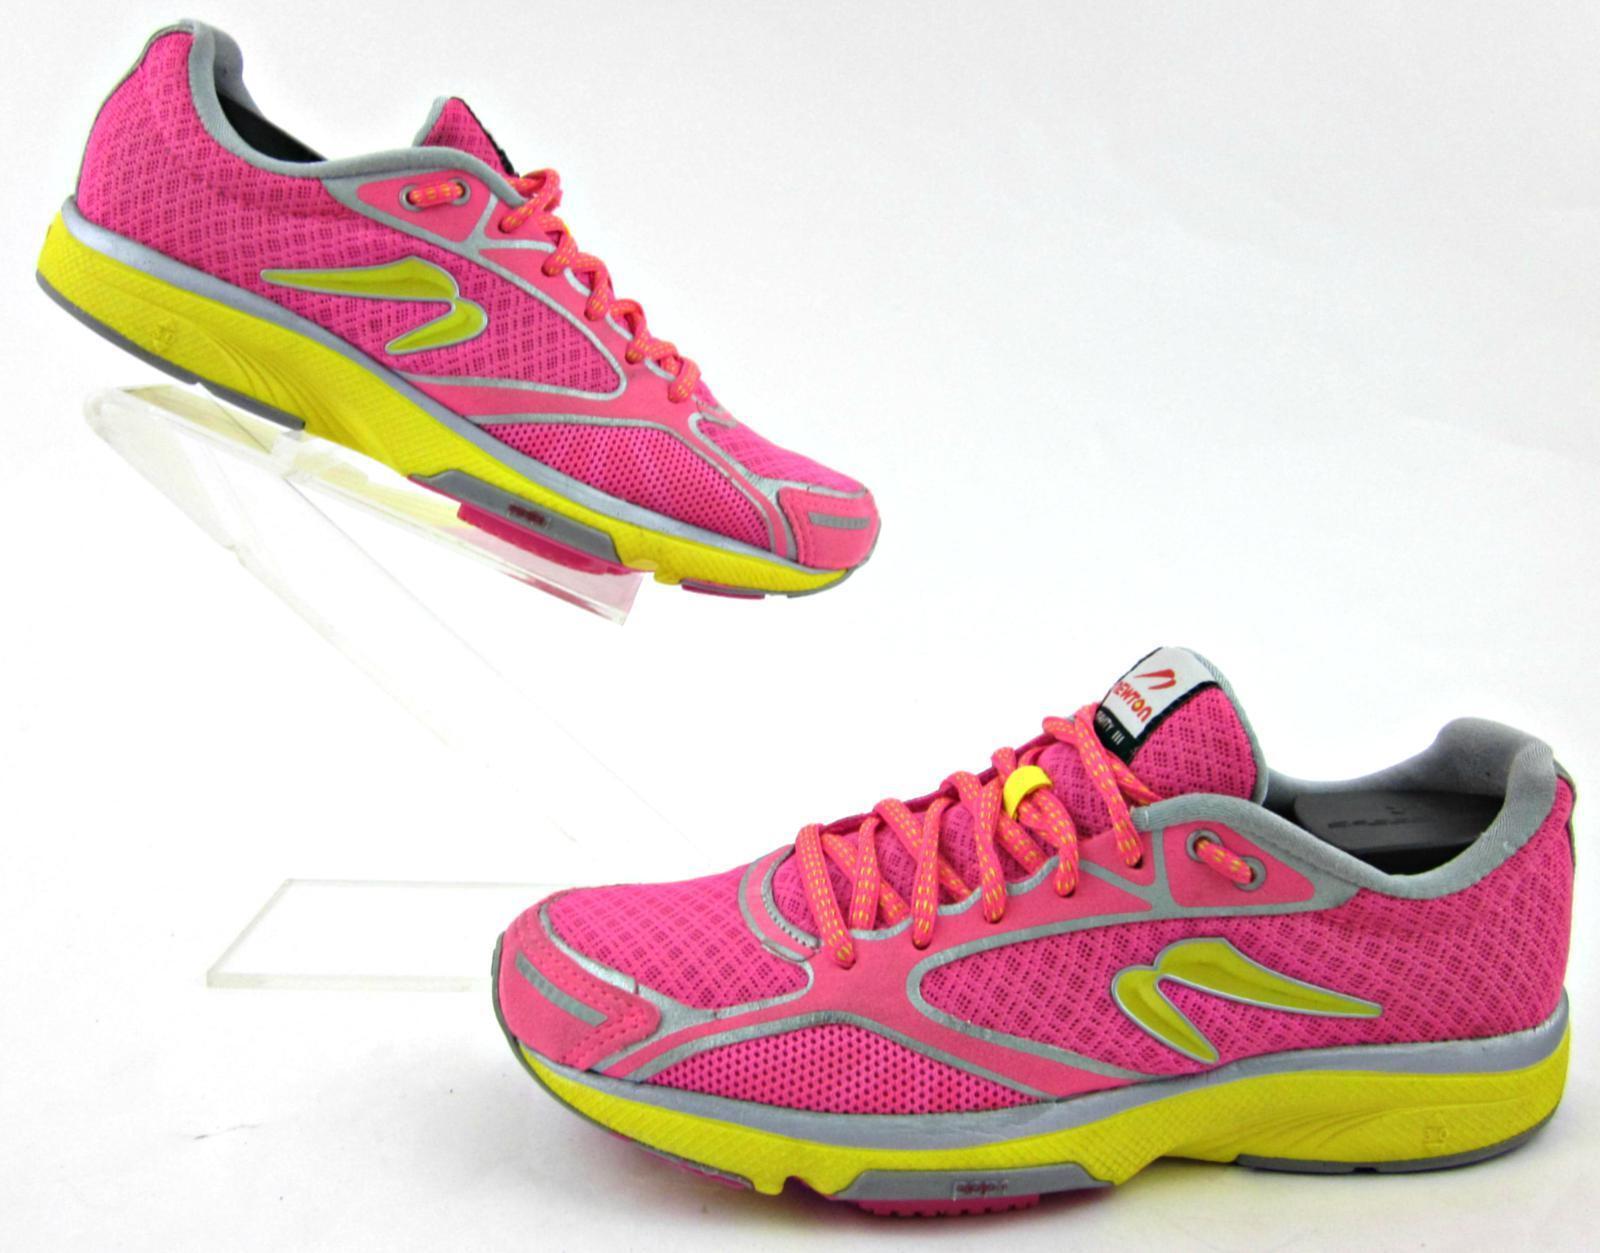 Newton Gravity III Womens Running Shoes Flash Pink Yellow US 6 Fantastic!!